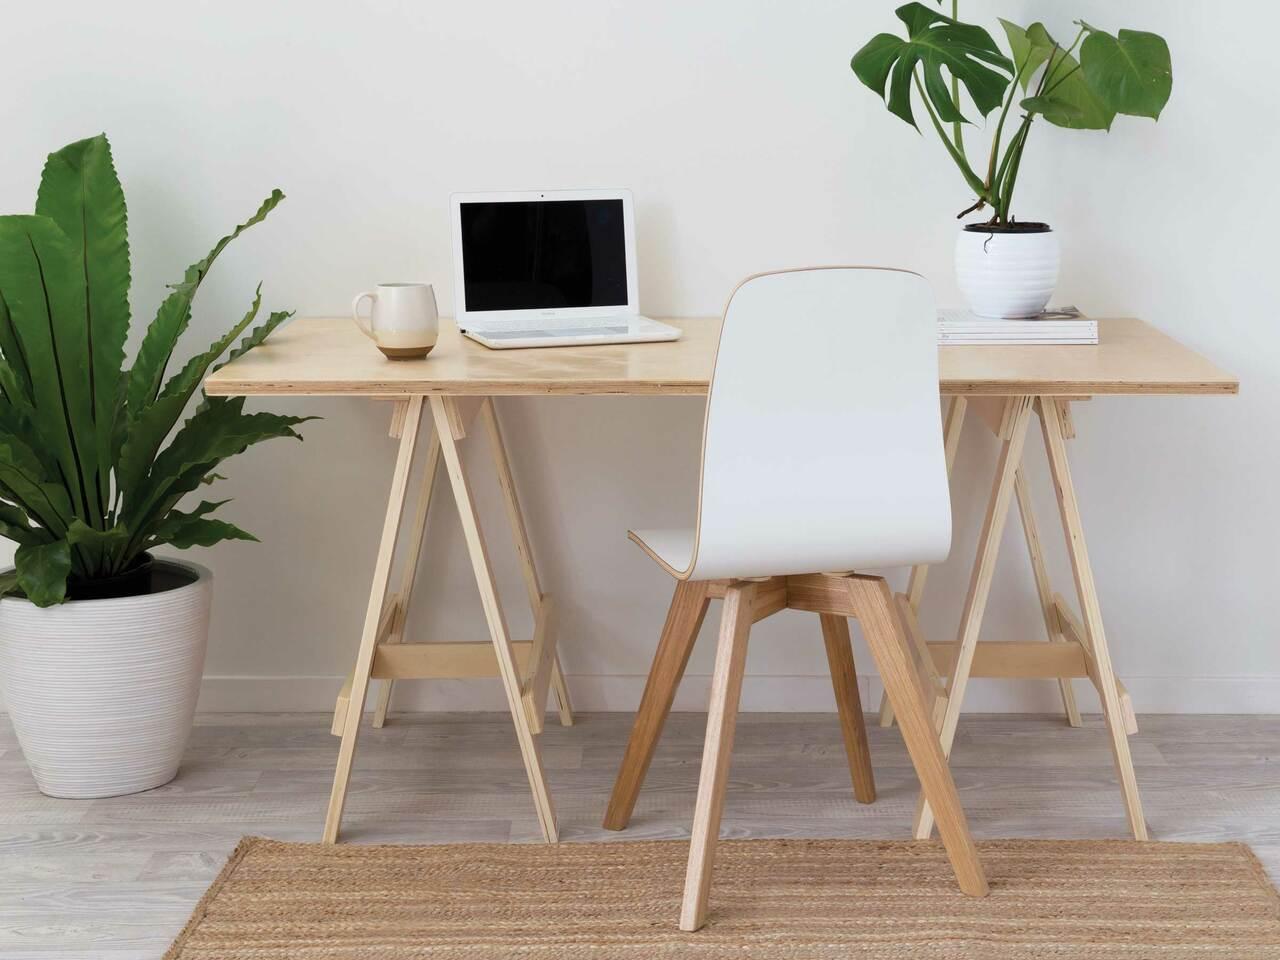 The Trestle Desk